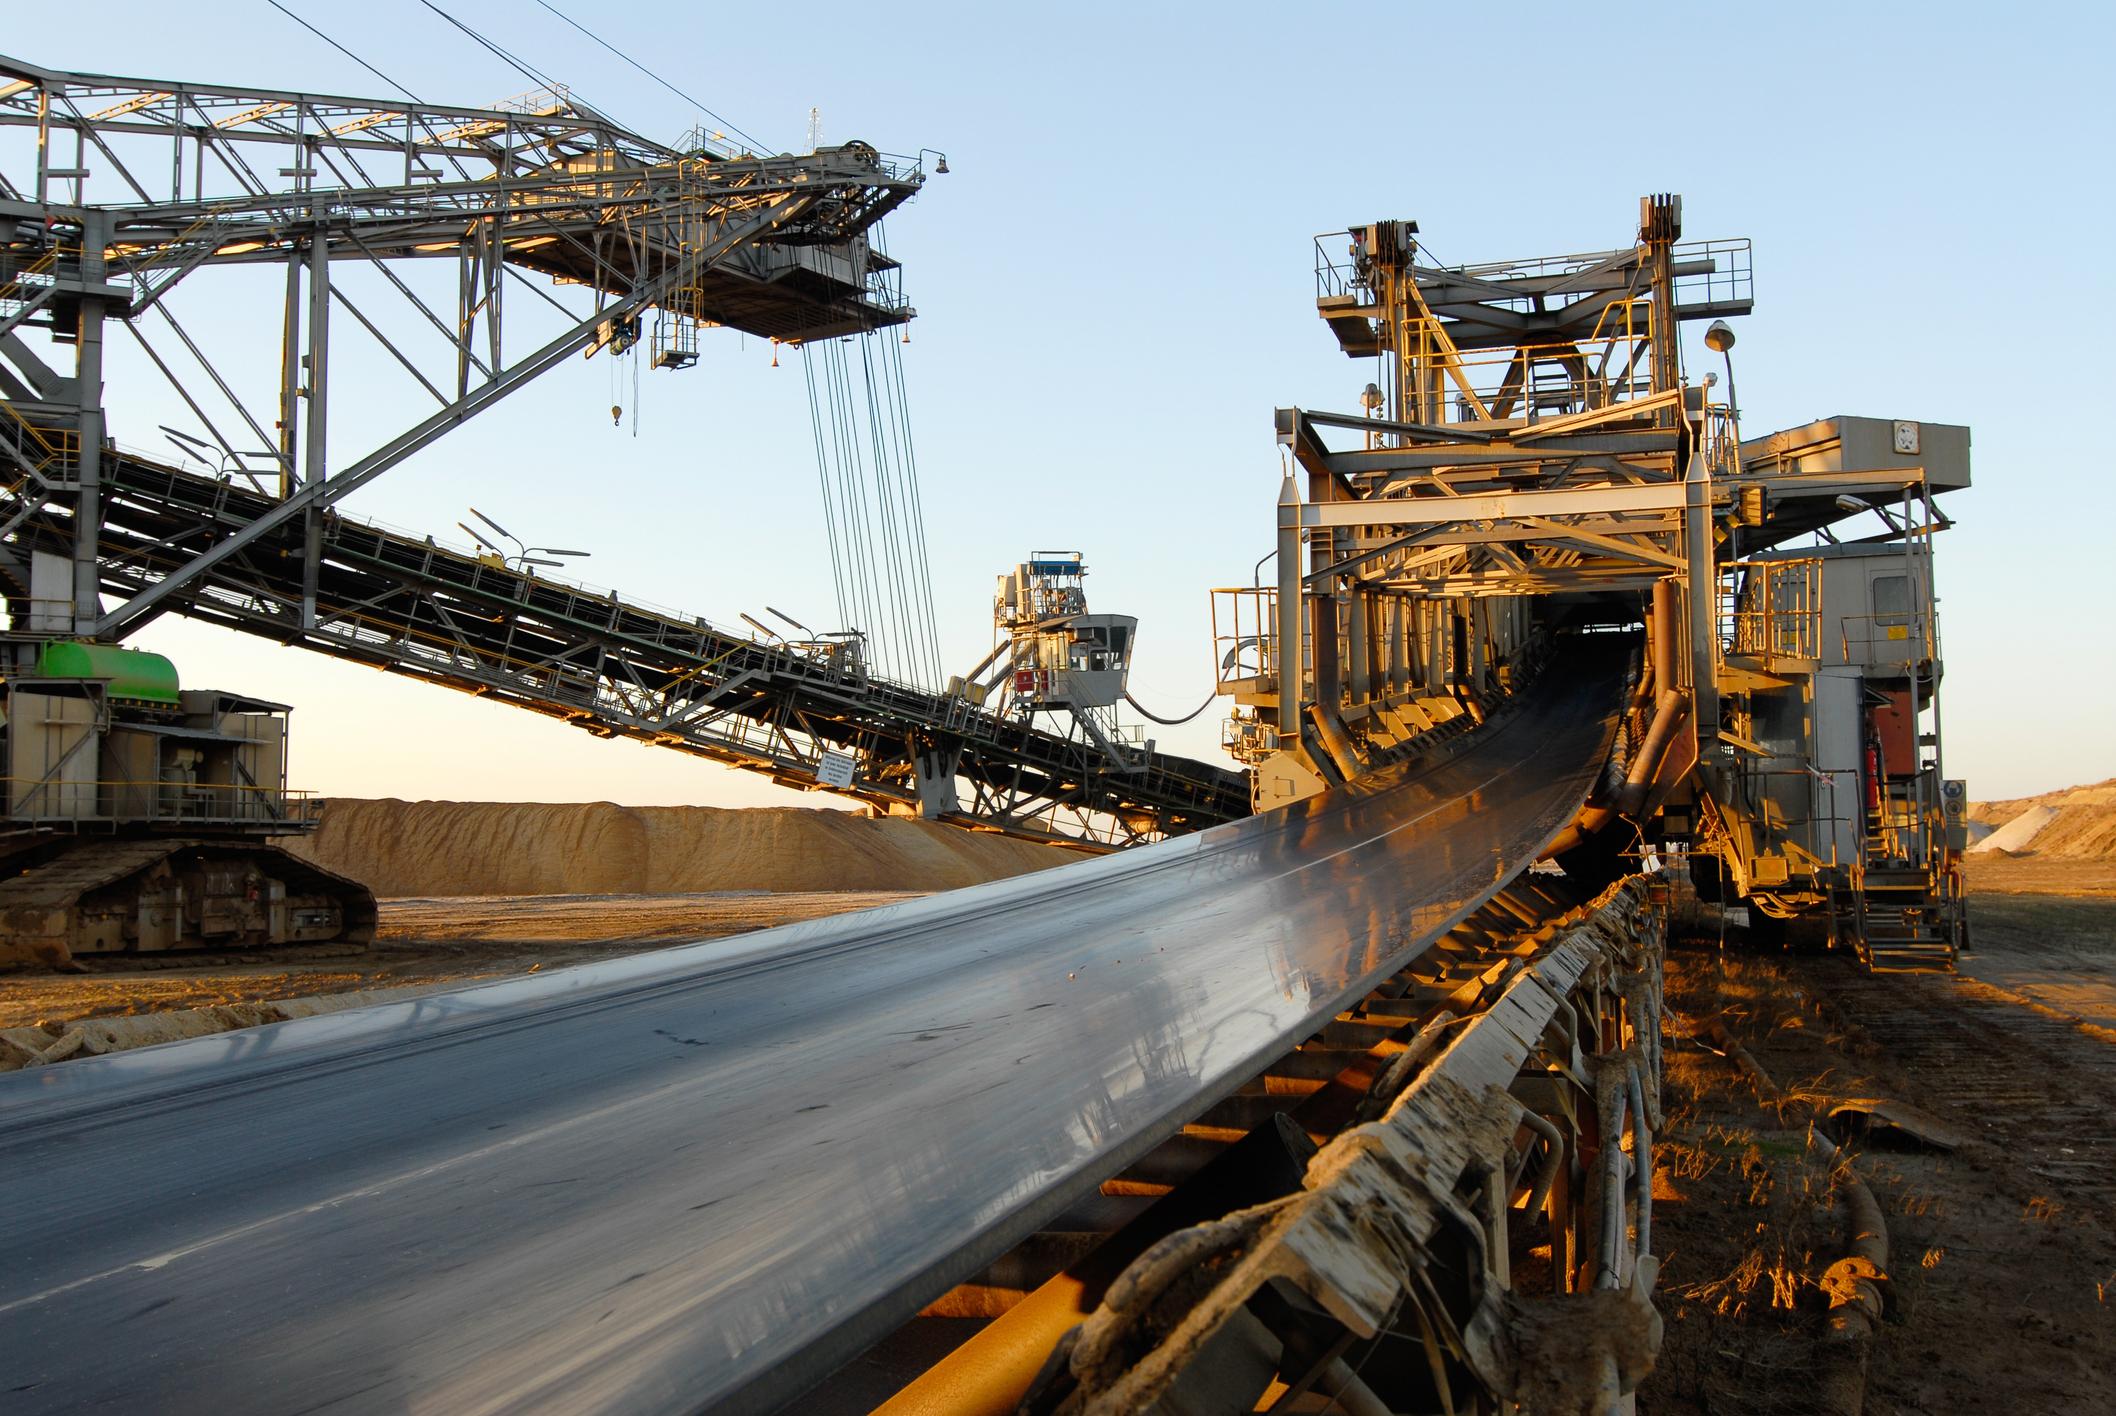 A coal mining project.